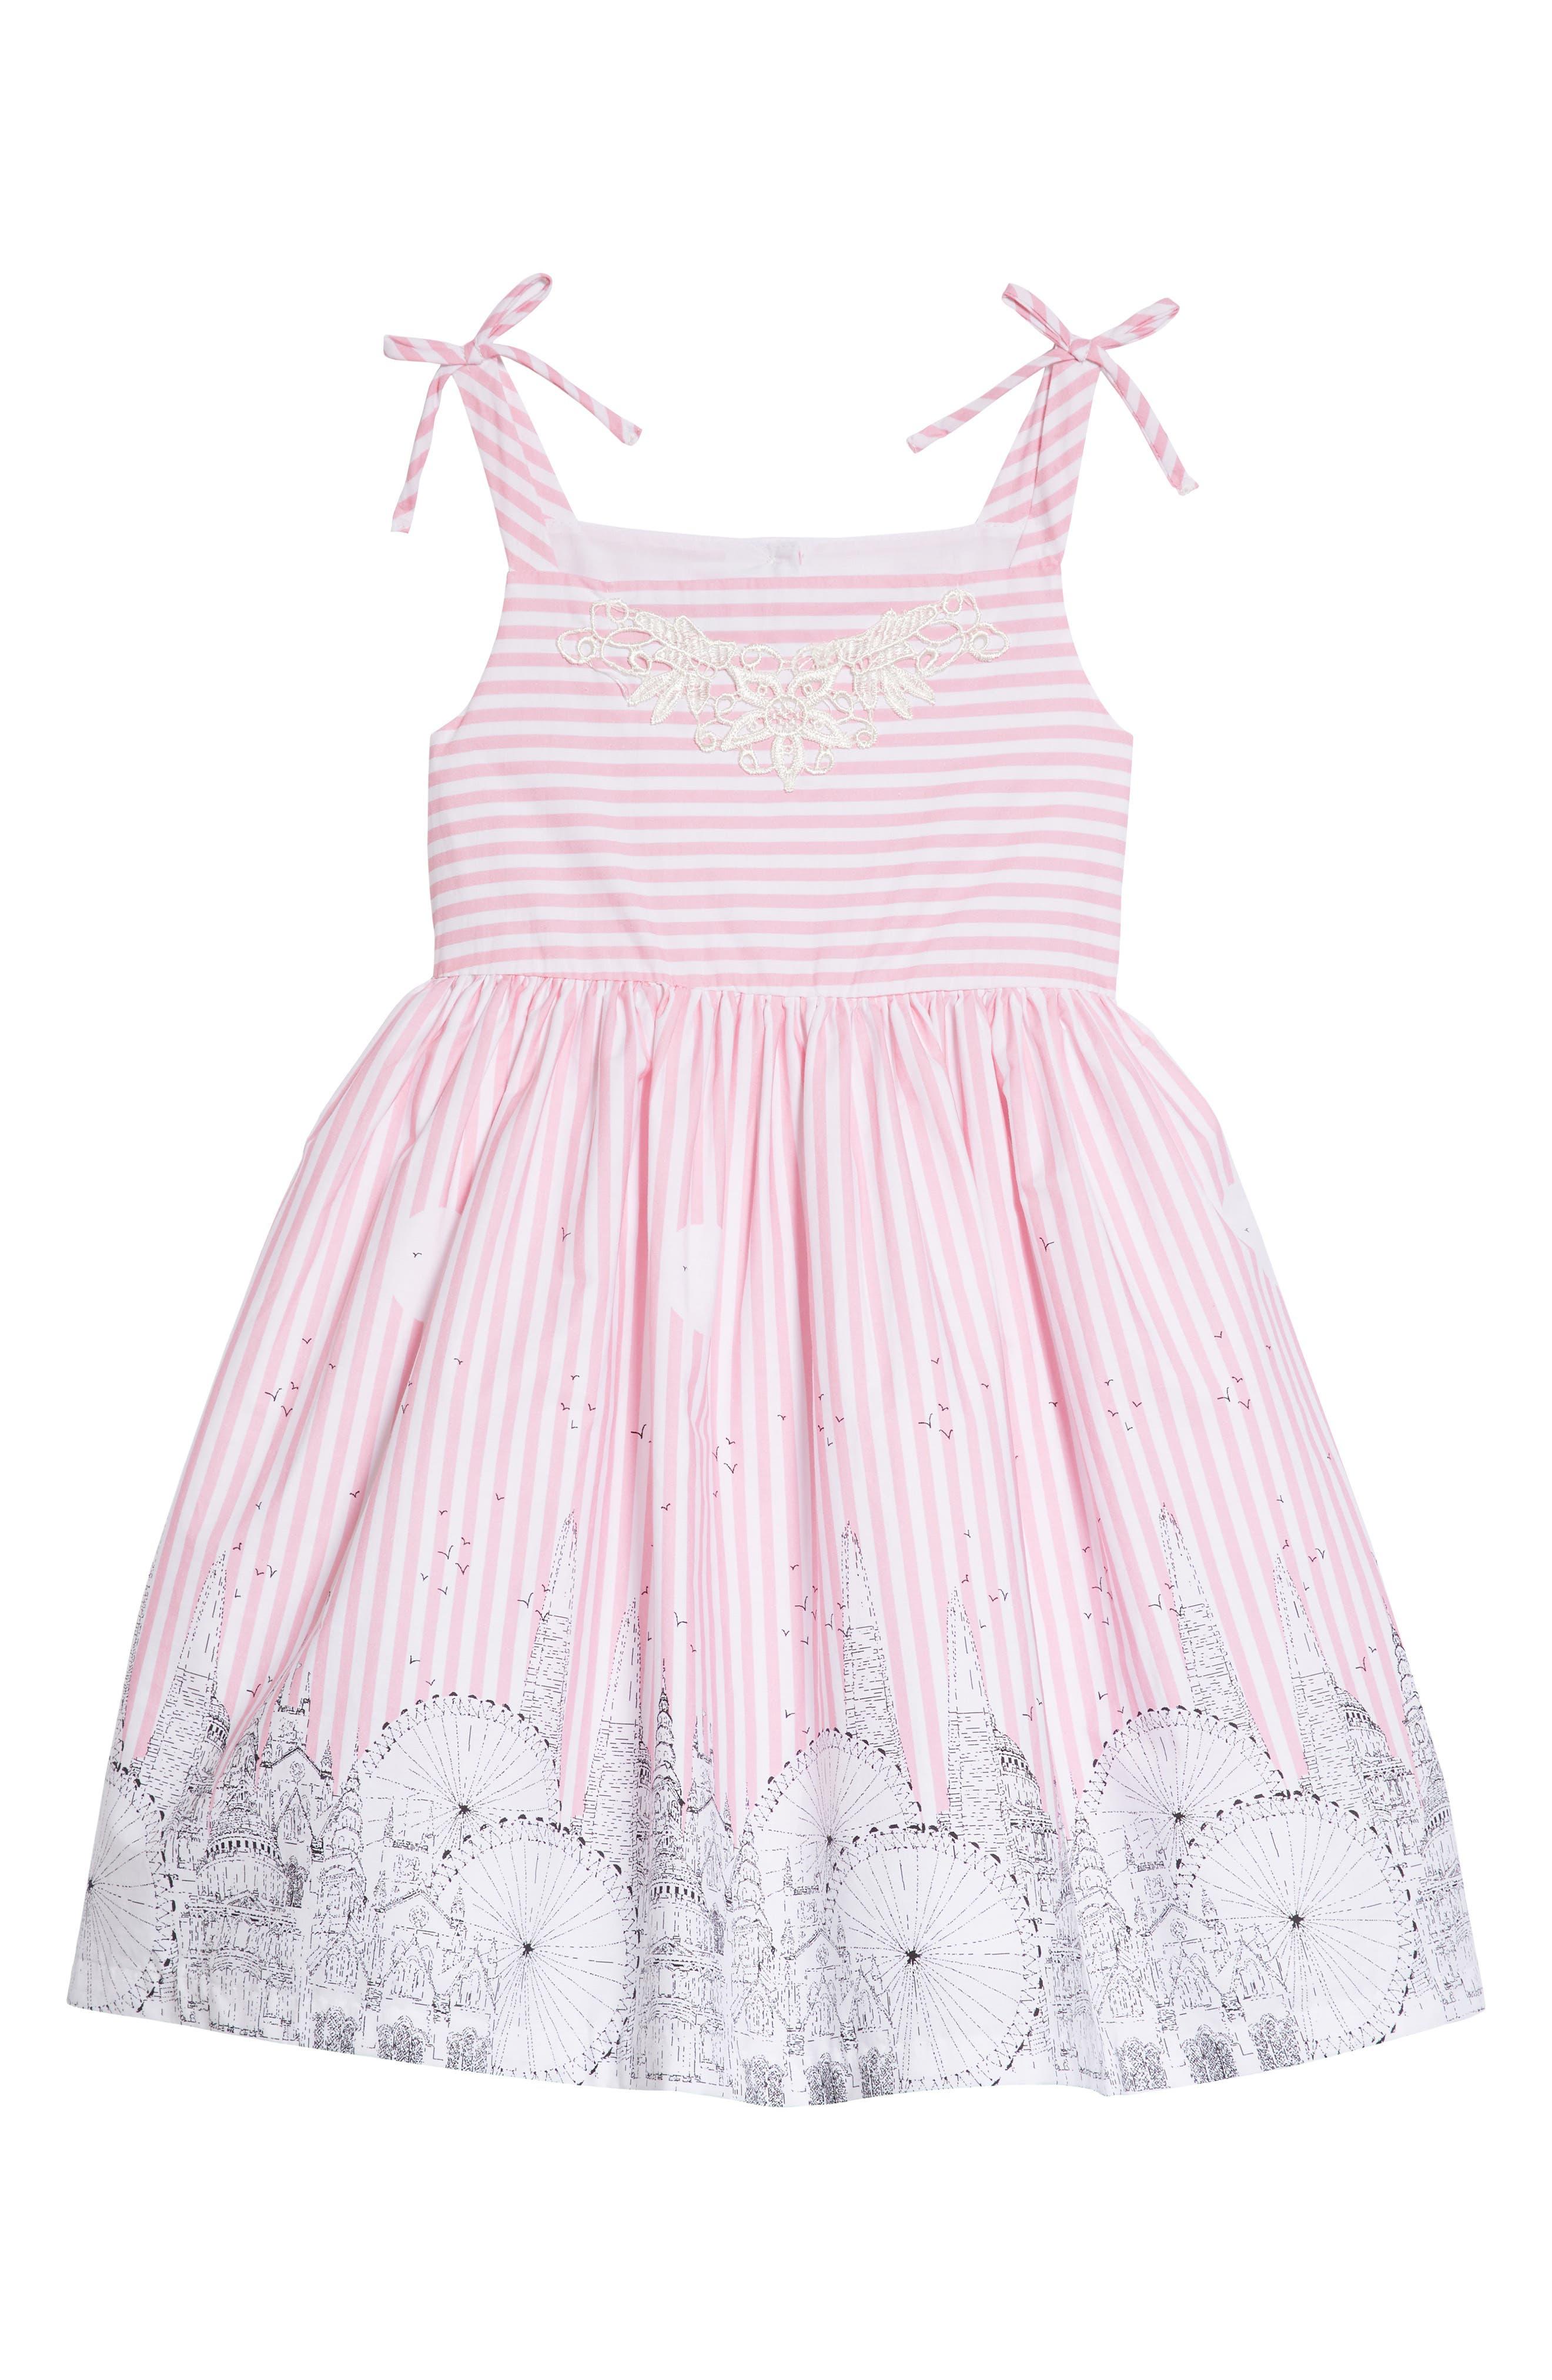 Cityscape Dress,                             Main thumbnail 1, color,                             Pink/ White